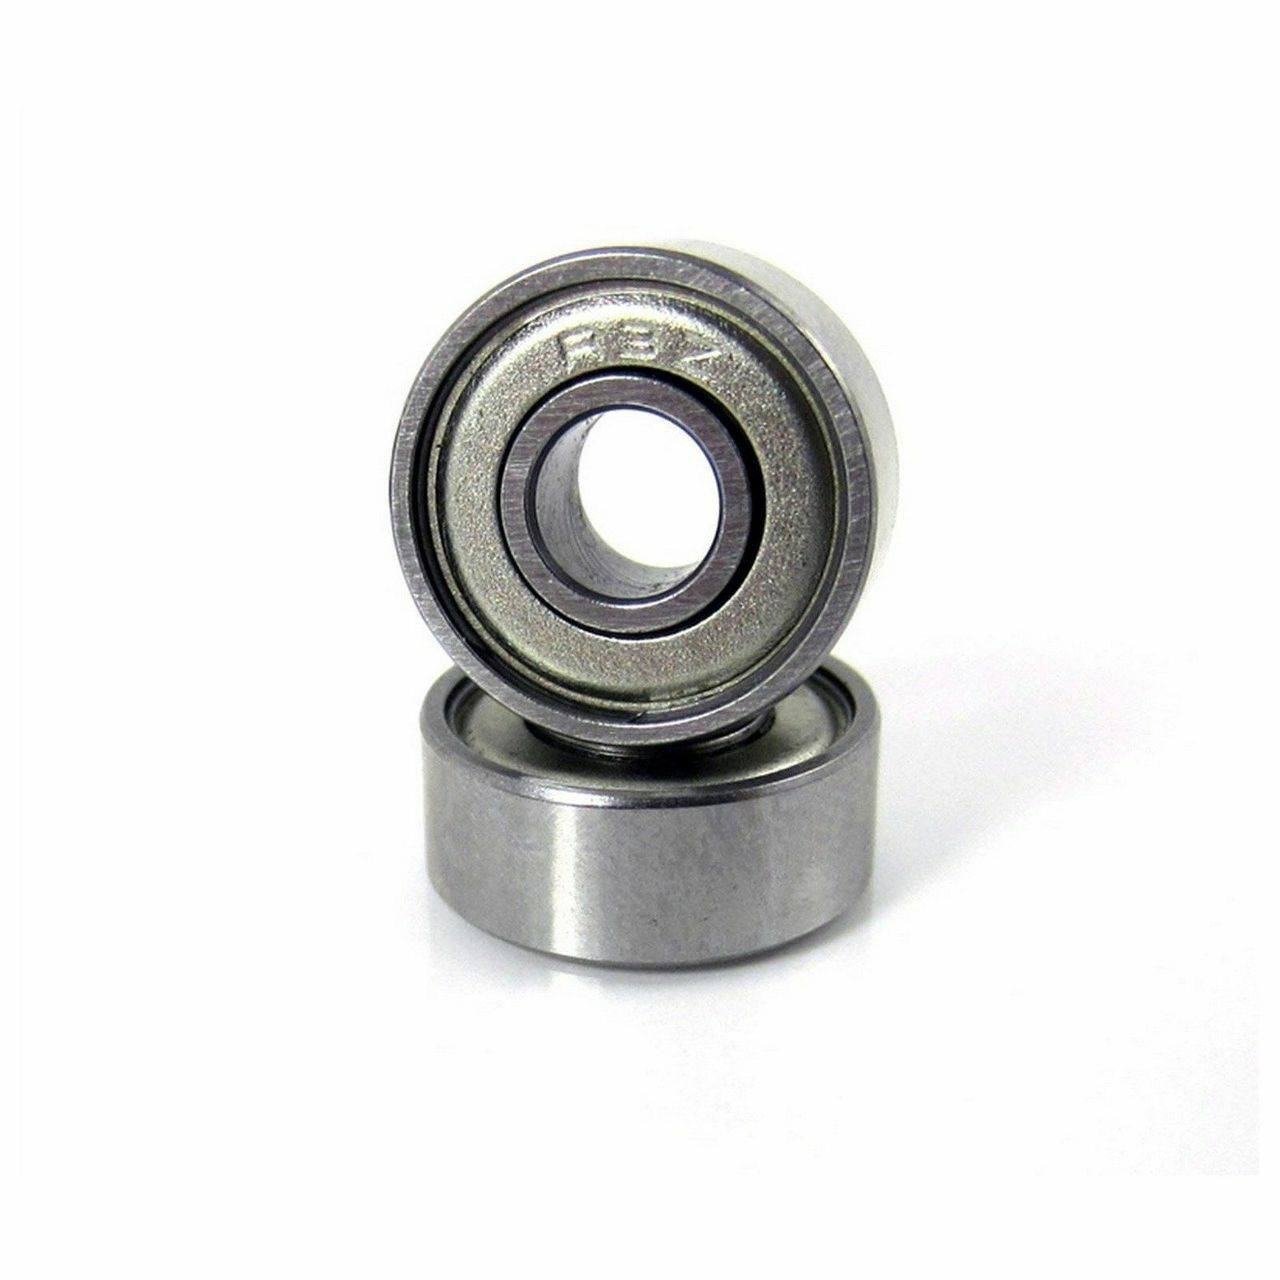 TRB RC 3/16x1/2x49/250 Precision Ceramic Ball Bearings Metal Shields (2)